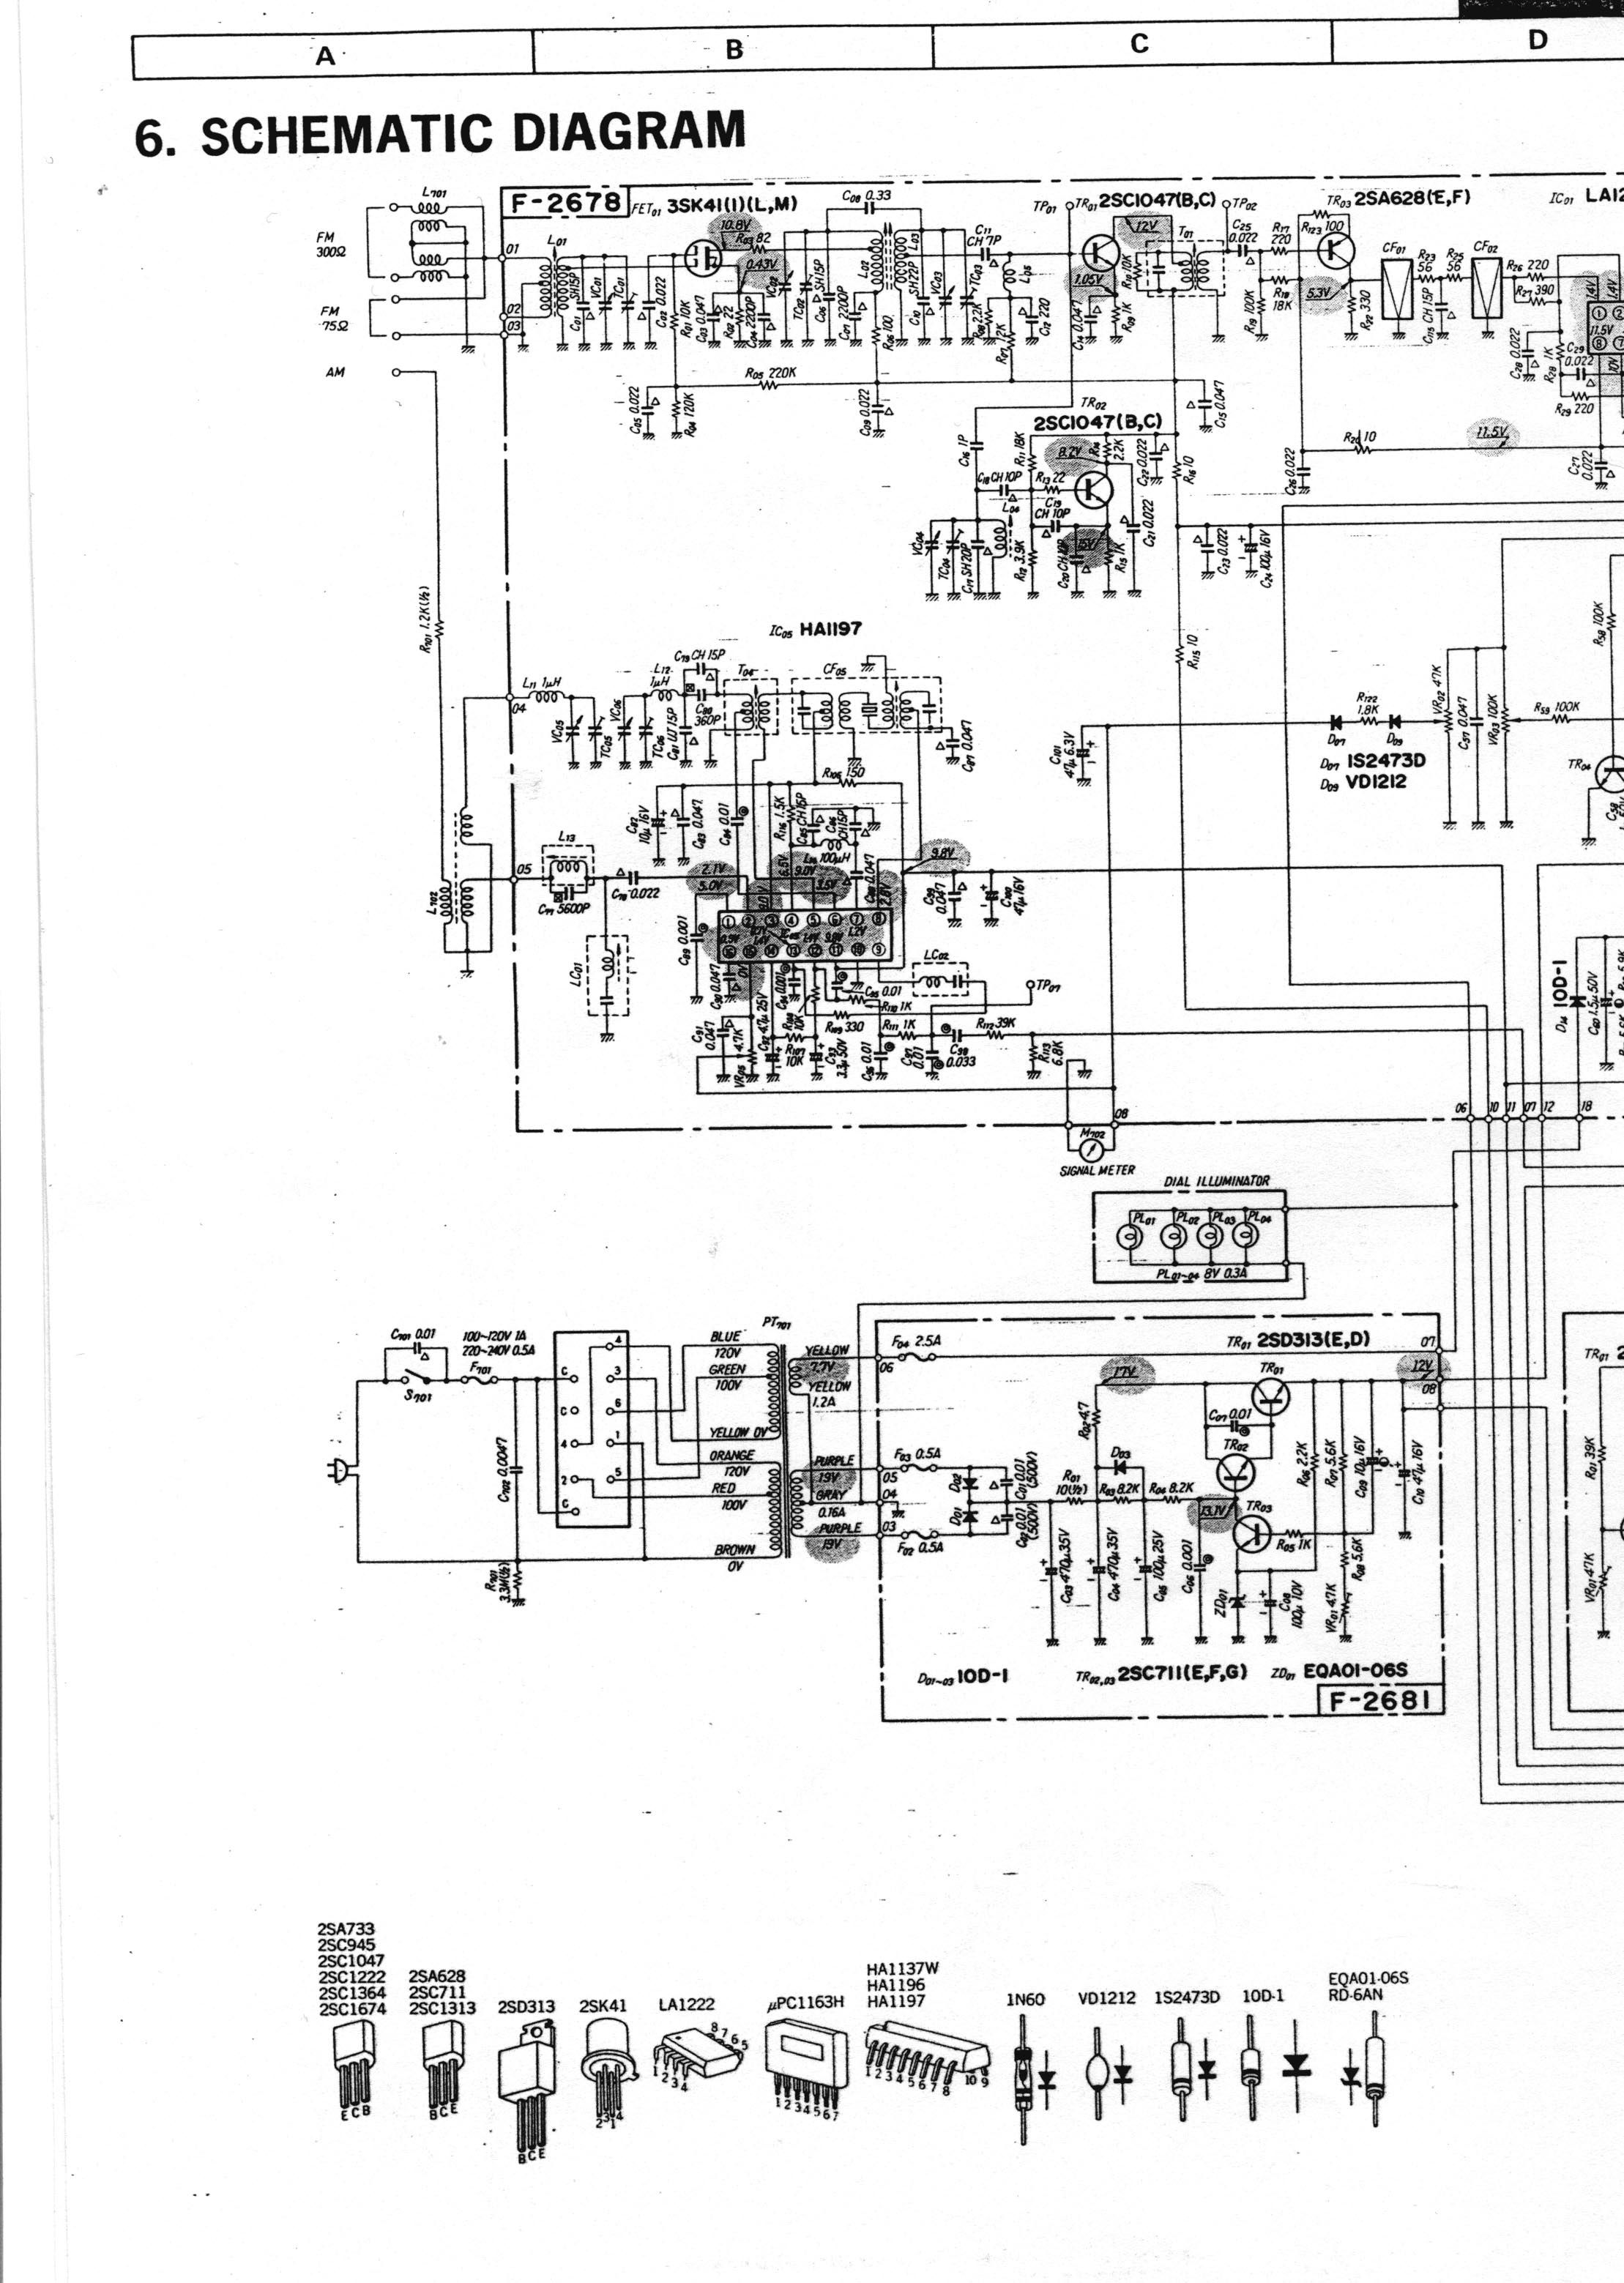 [SODI_2457]   Sansui Tv Circuit Diagram Free Download - Circuit Diagram Images | Circuit  diagram, Circuit board design, Circuit | T V Circuit Diagram Free Download |  | Pinterest